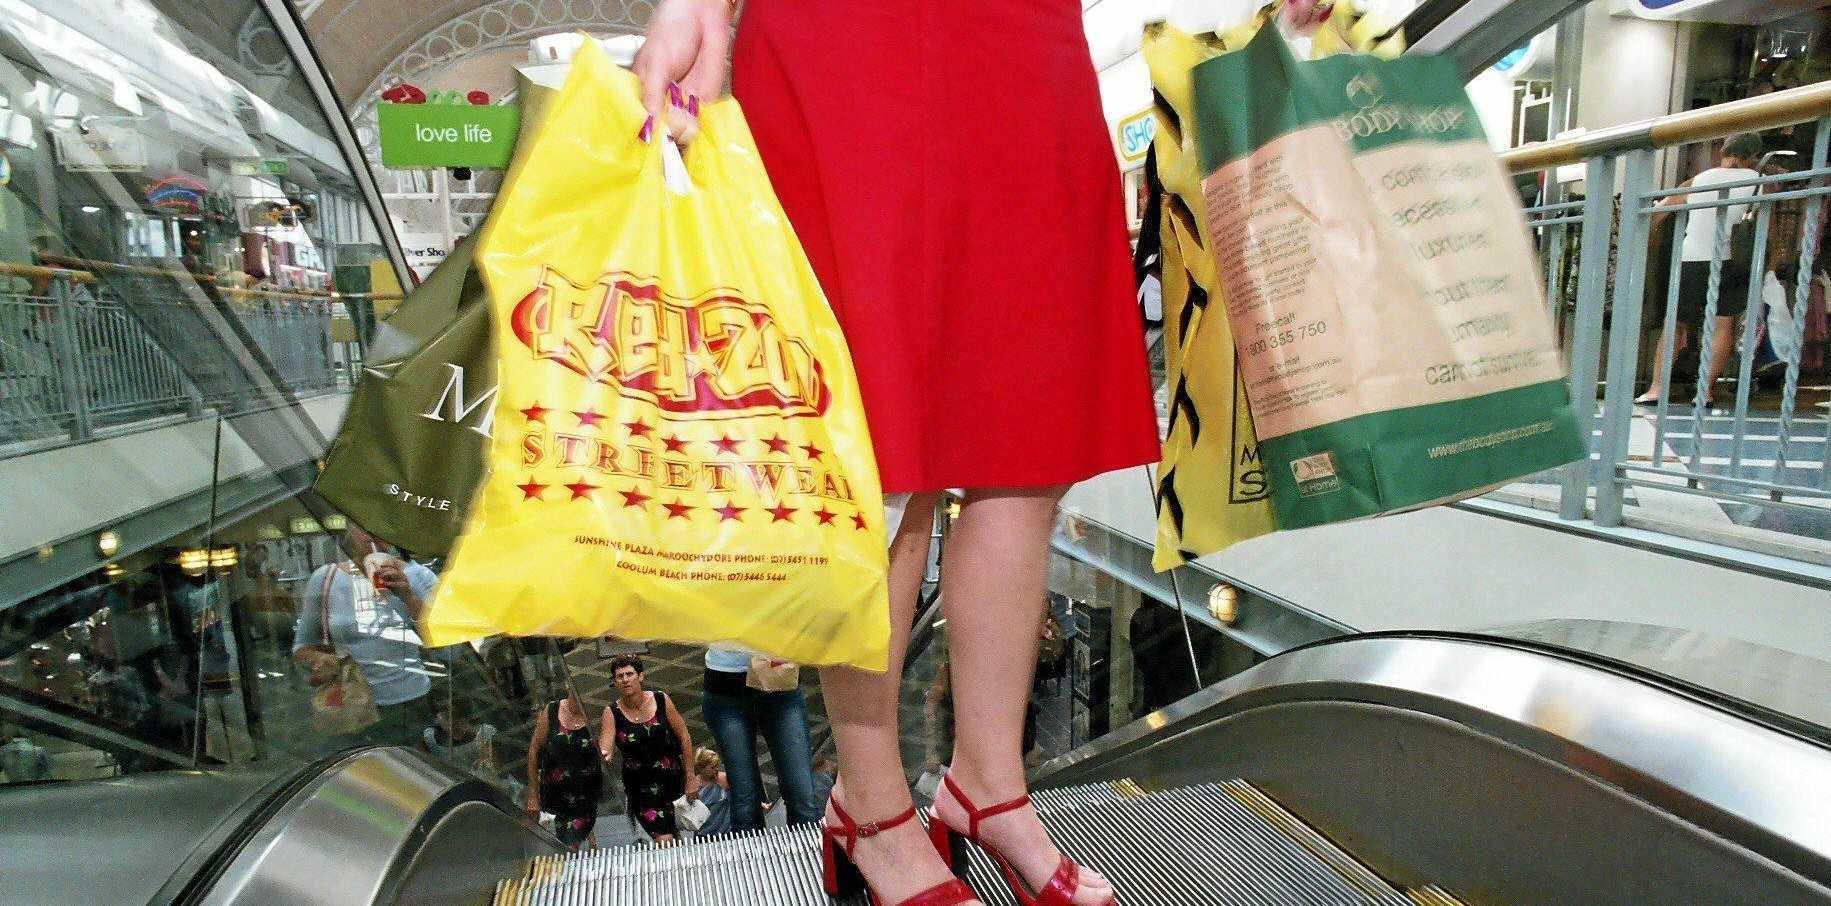 Retail ShoppingPhoto Lisa Williams / Sunshine Coast Daily